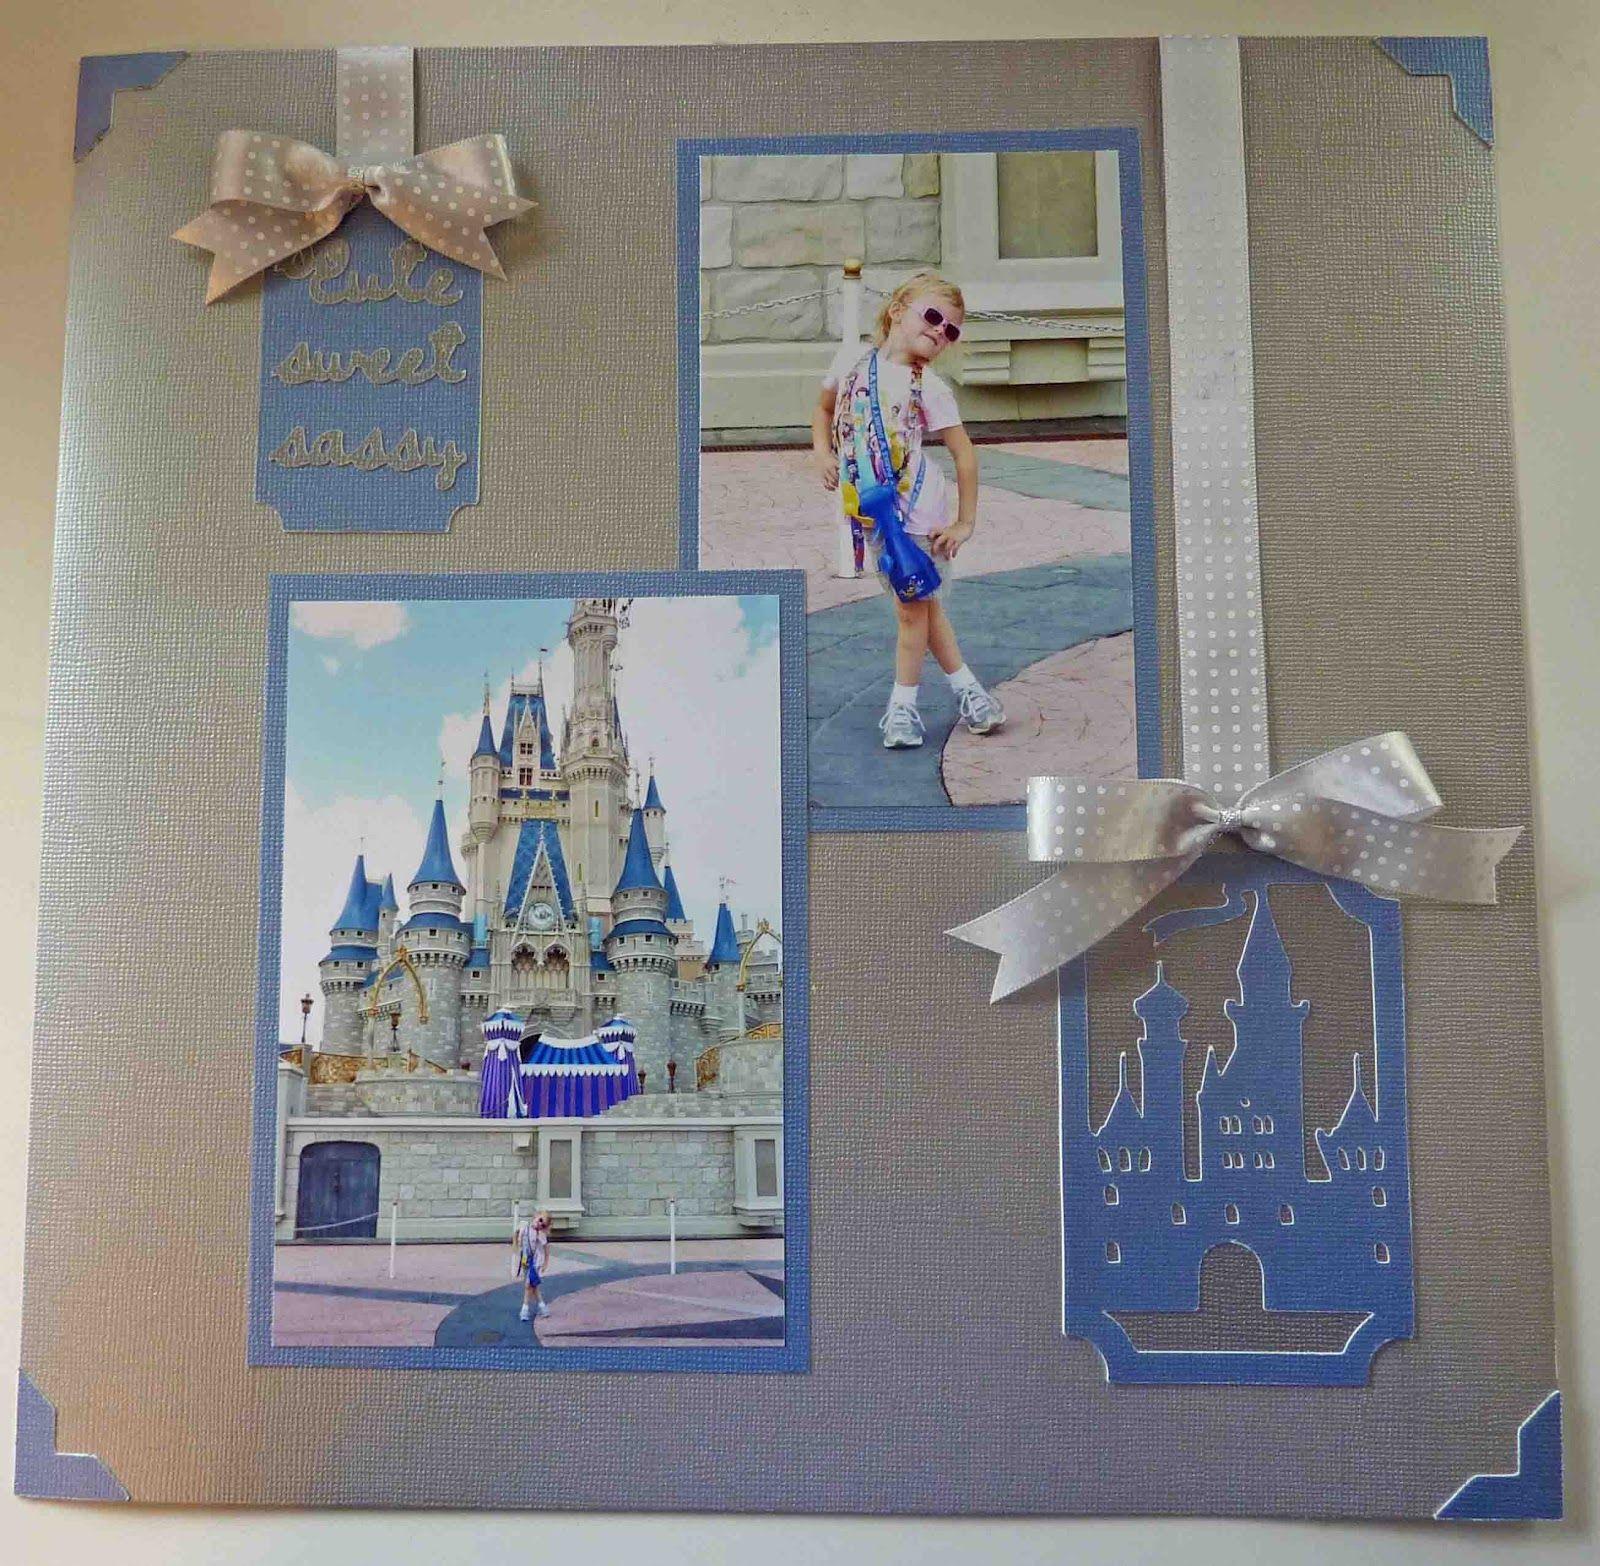 Wedding scrapbook ideas using cricut - Cinderella S Castle Layout Using Wrap It Up Cricut Cartridge Wedding Scrapbookdisney